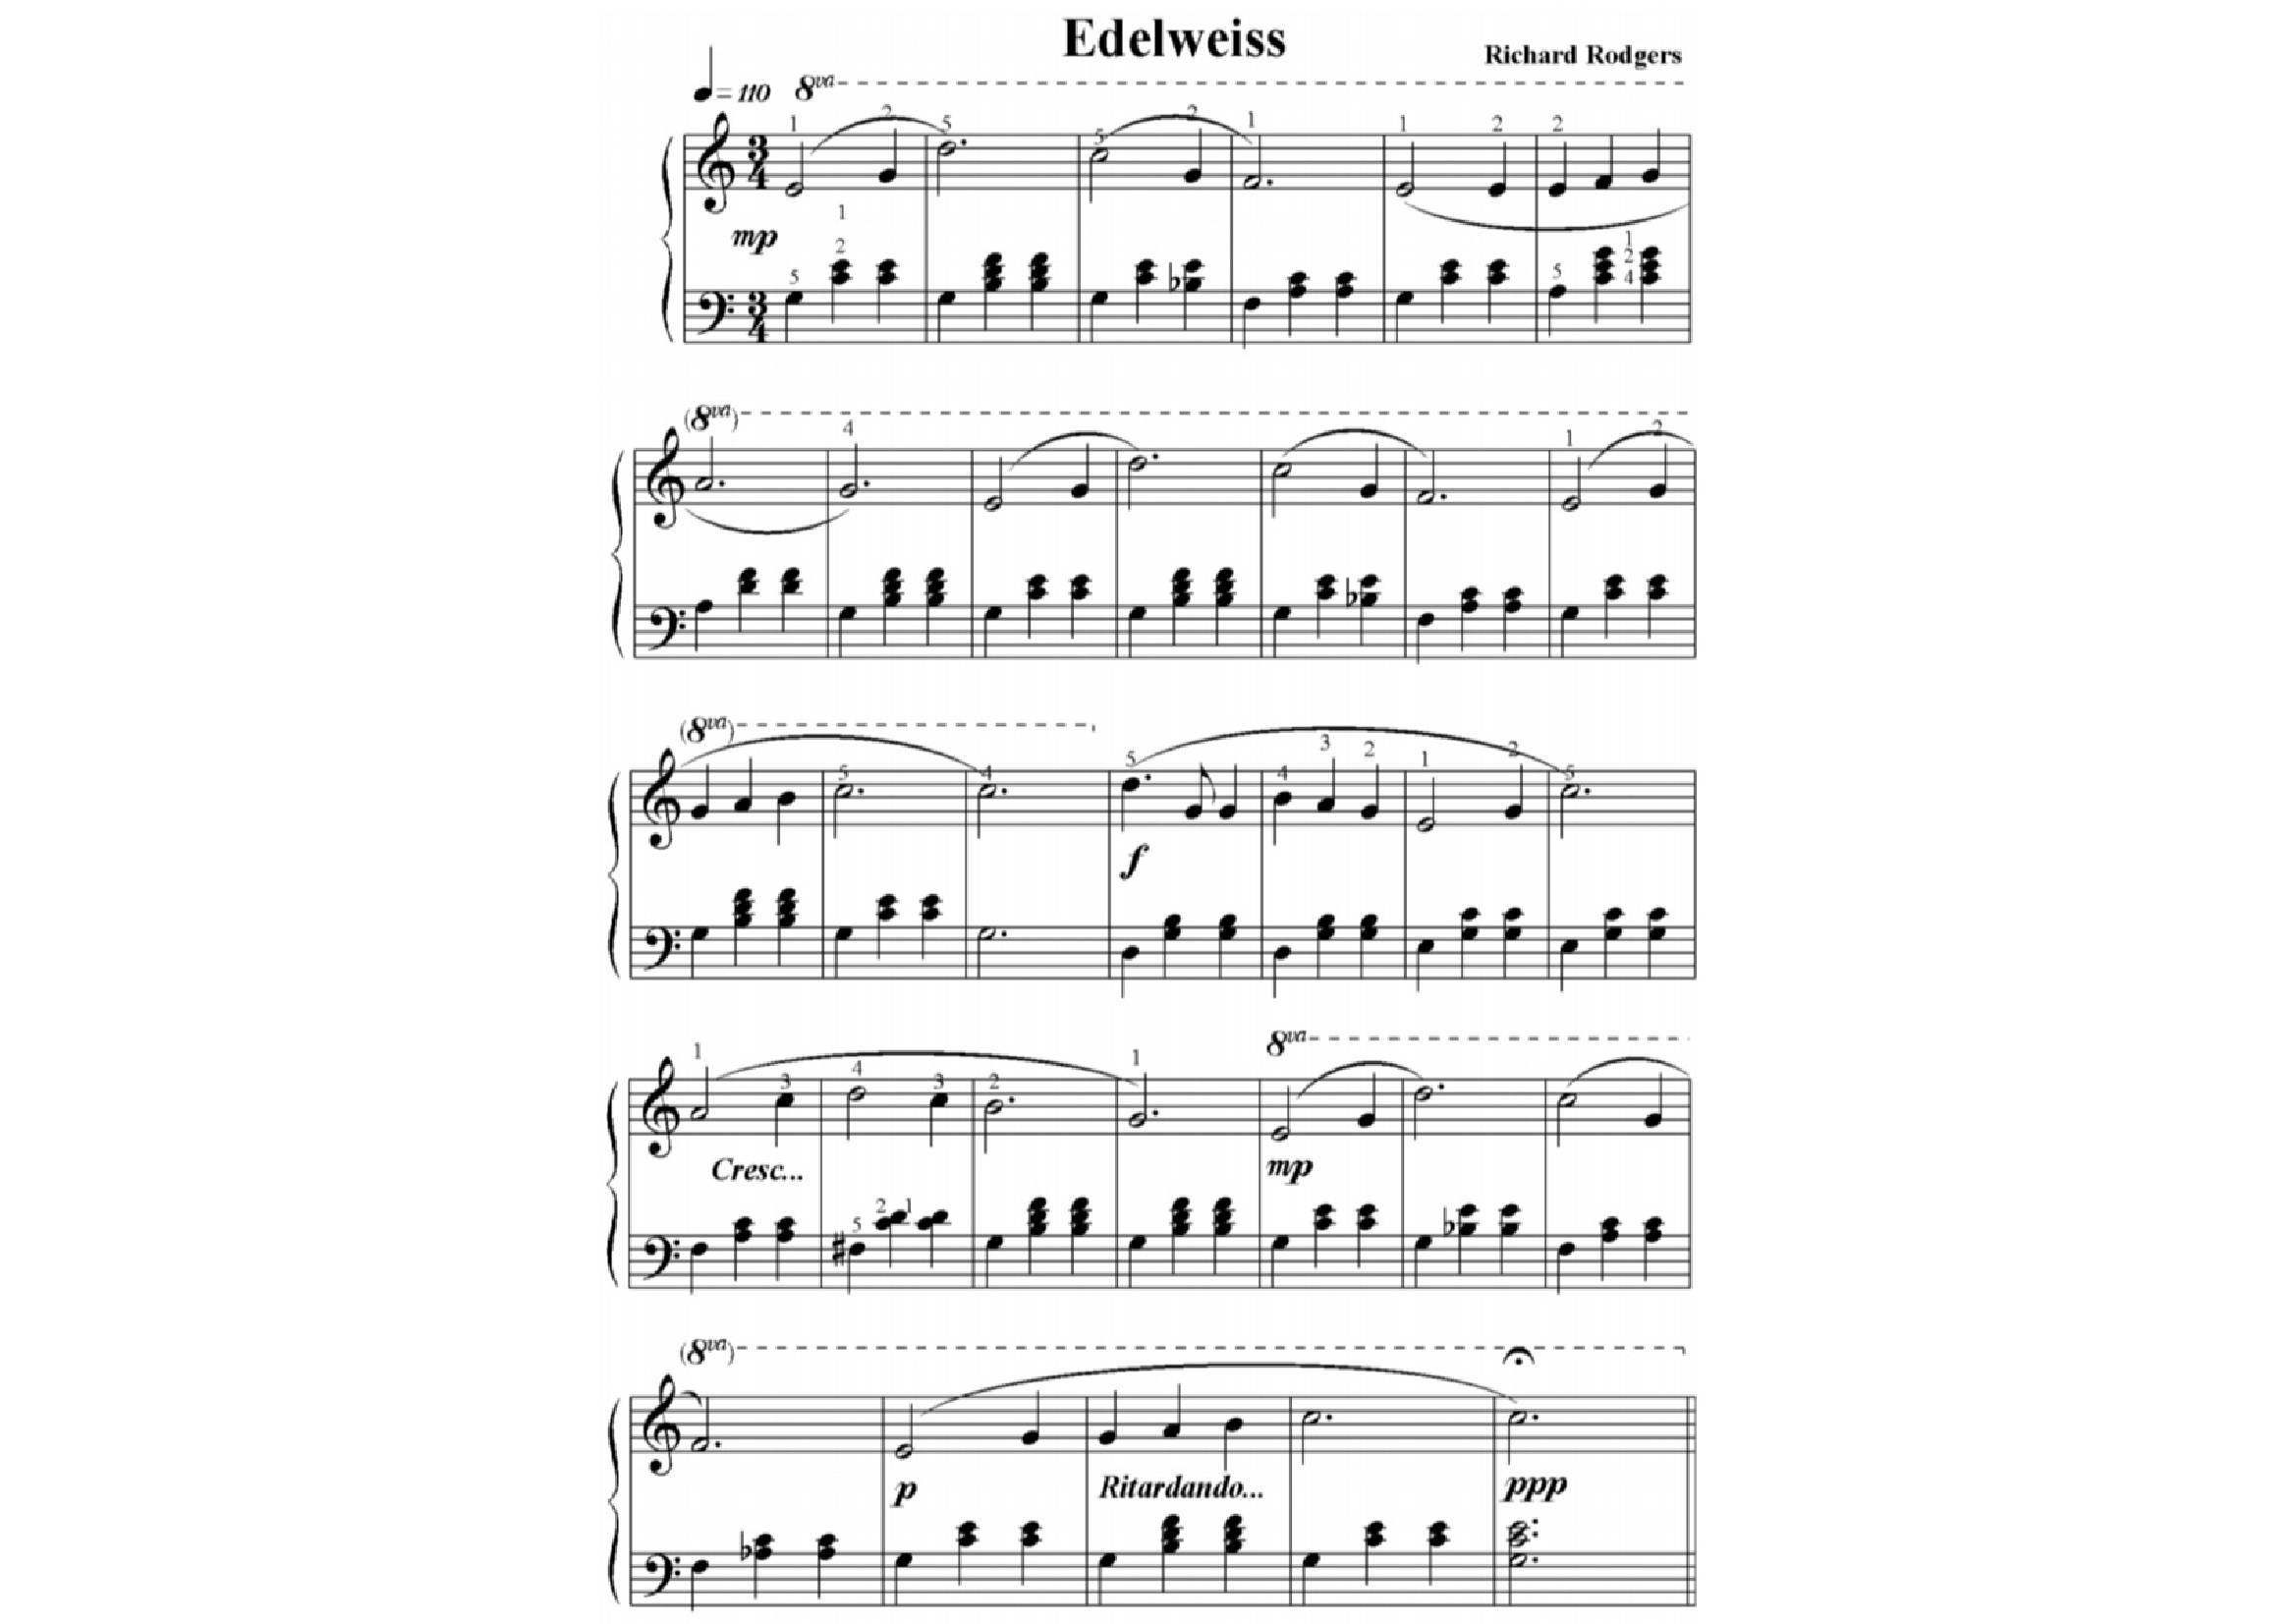 Richard roger Edelweiss - نت آهنگ Edelweiss از Richard roger